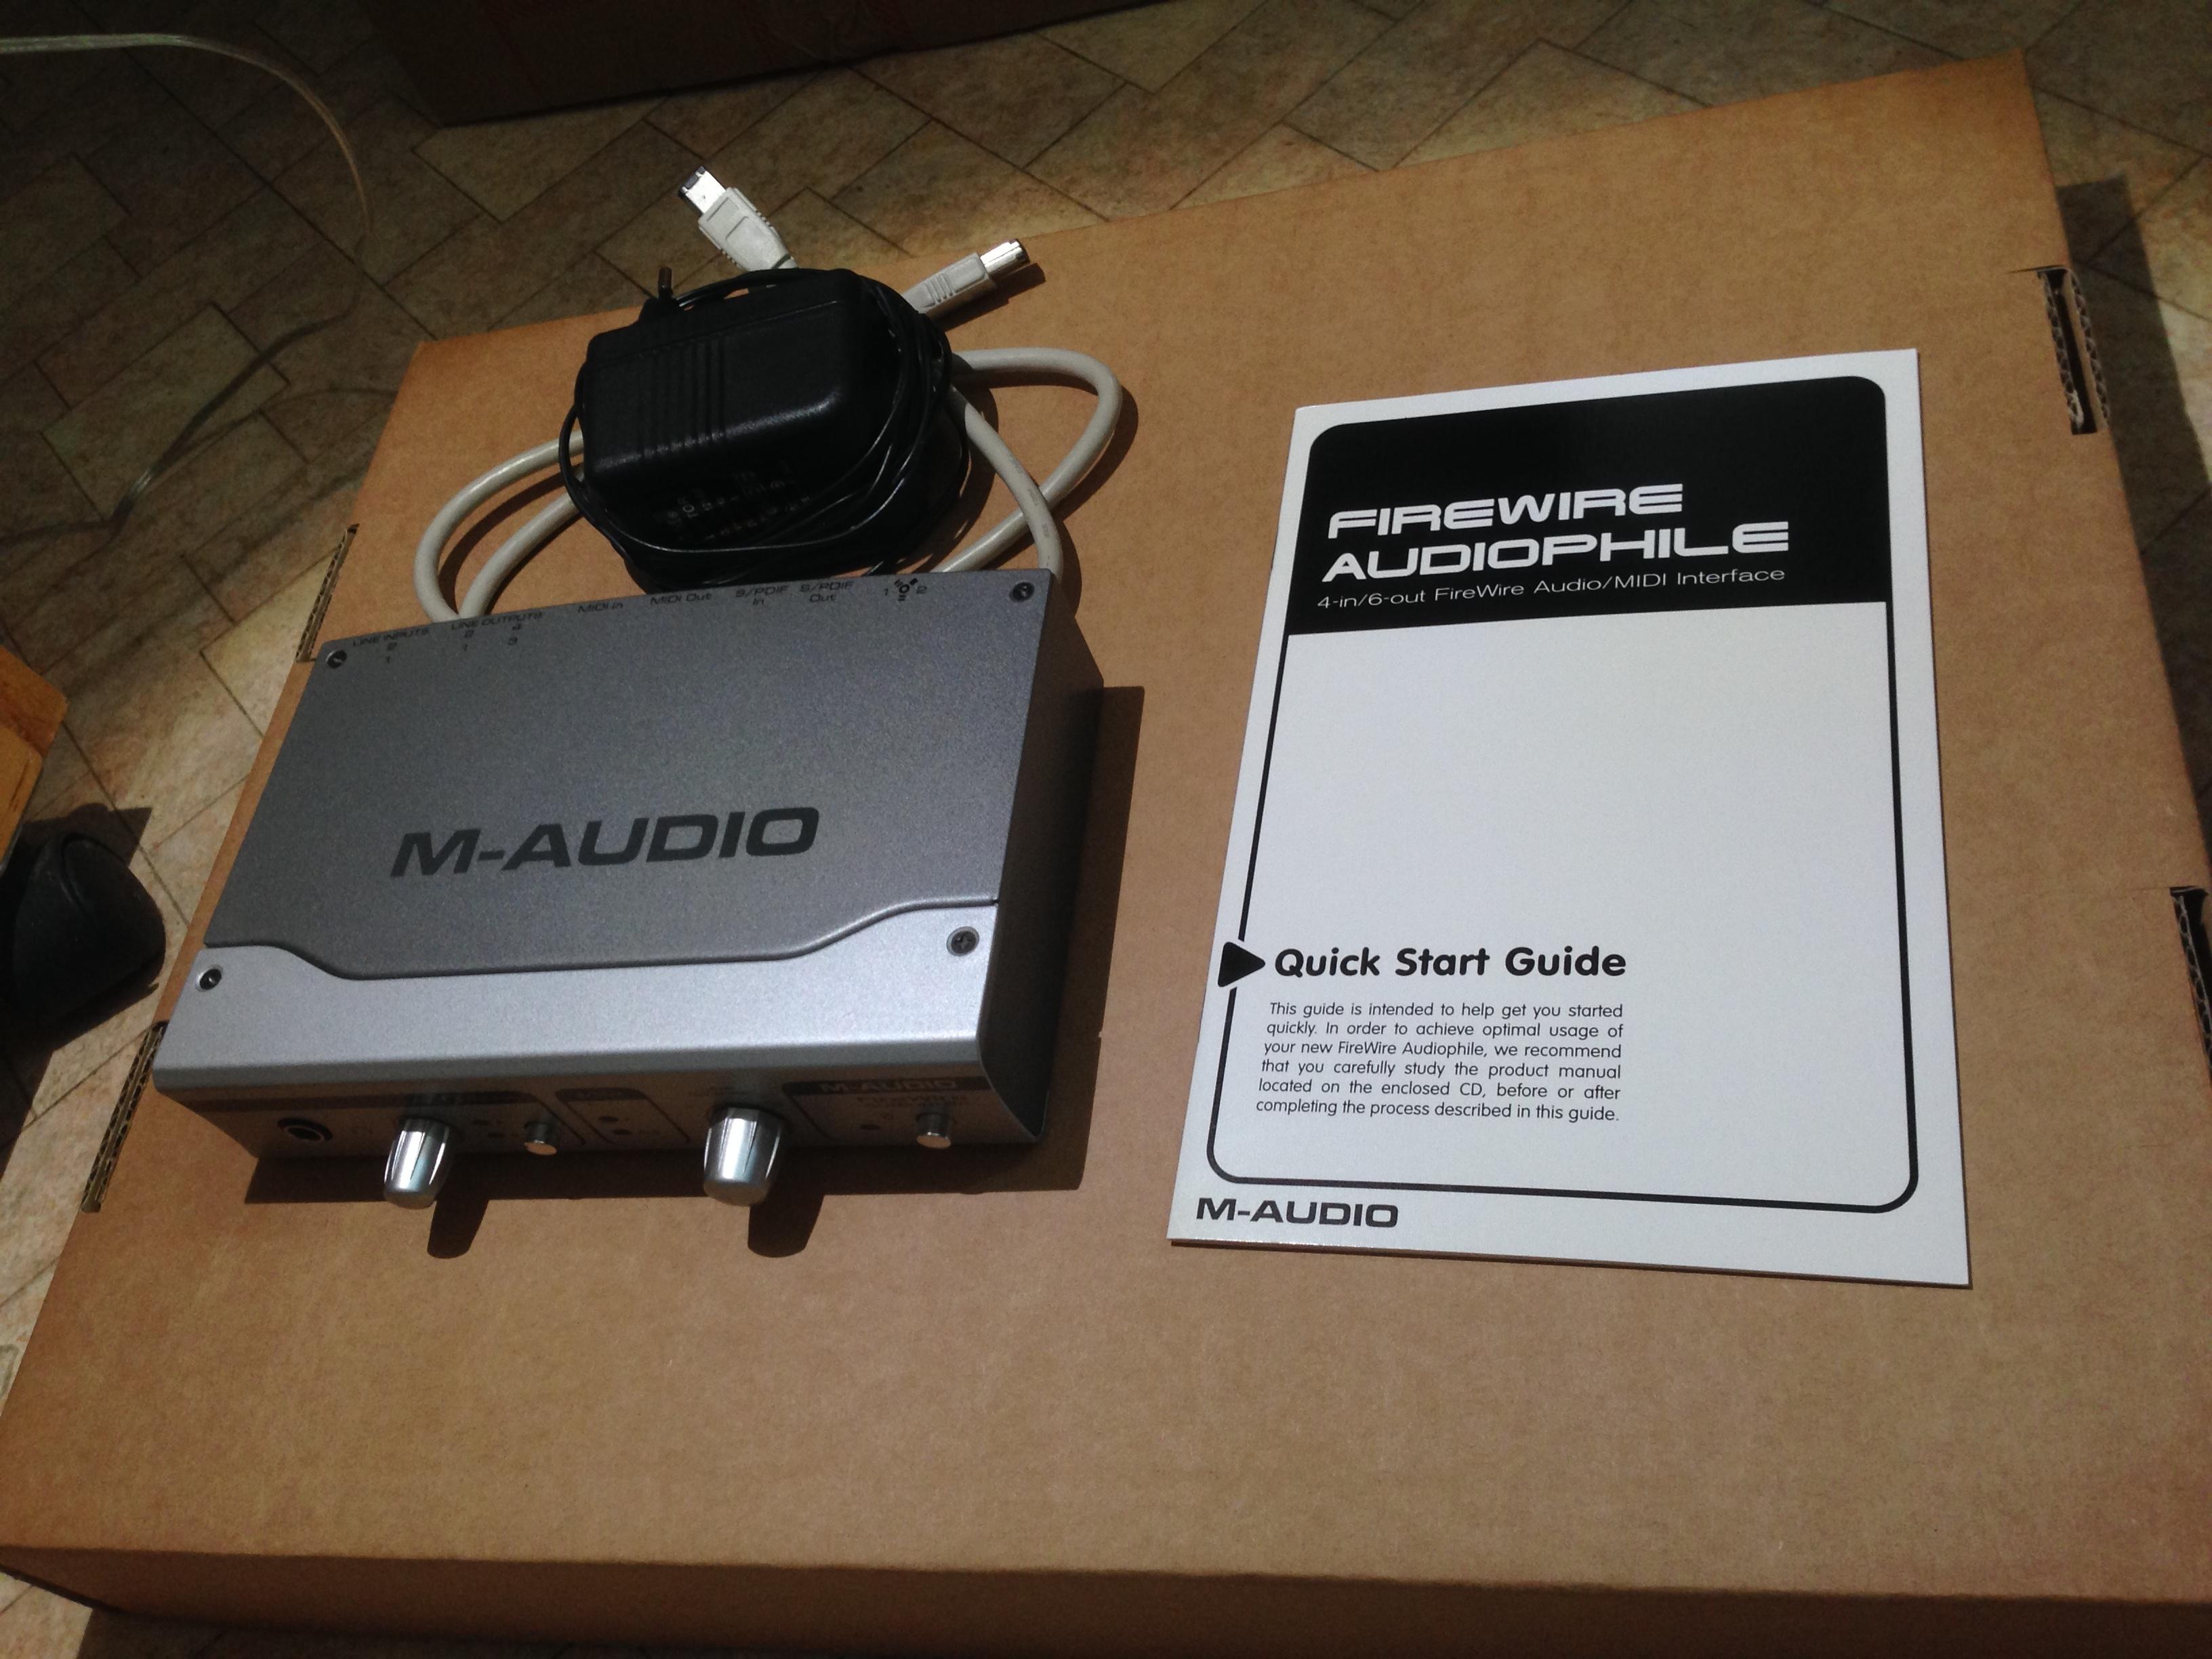 M-Audio Firewire Audiophile image (#1171937) - Audiofanzine